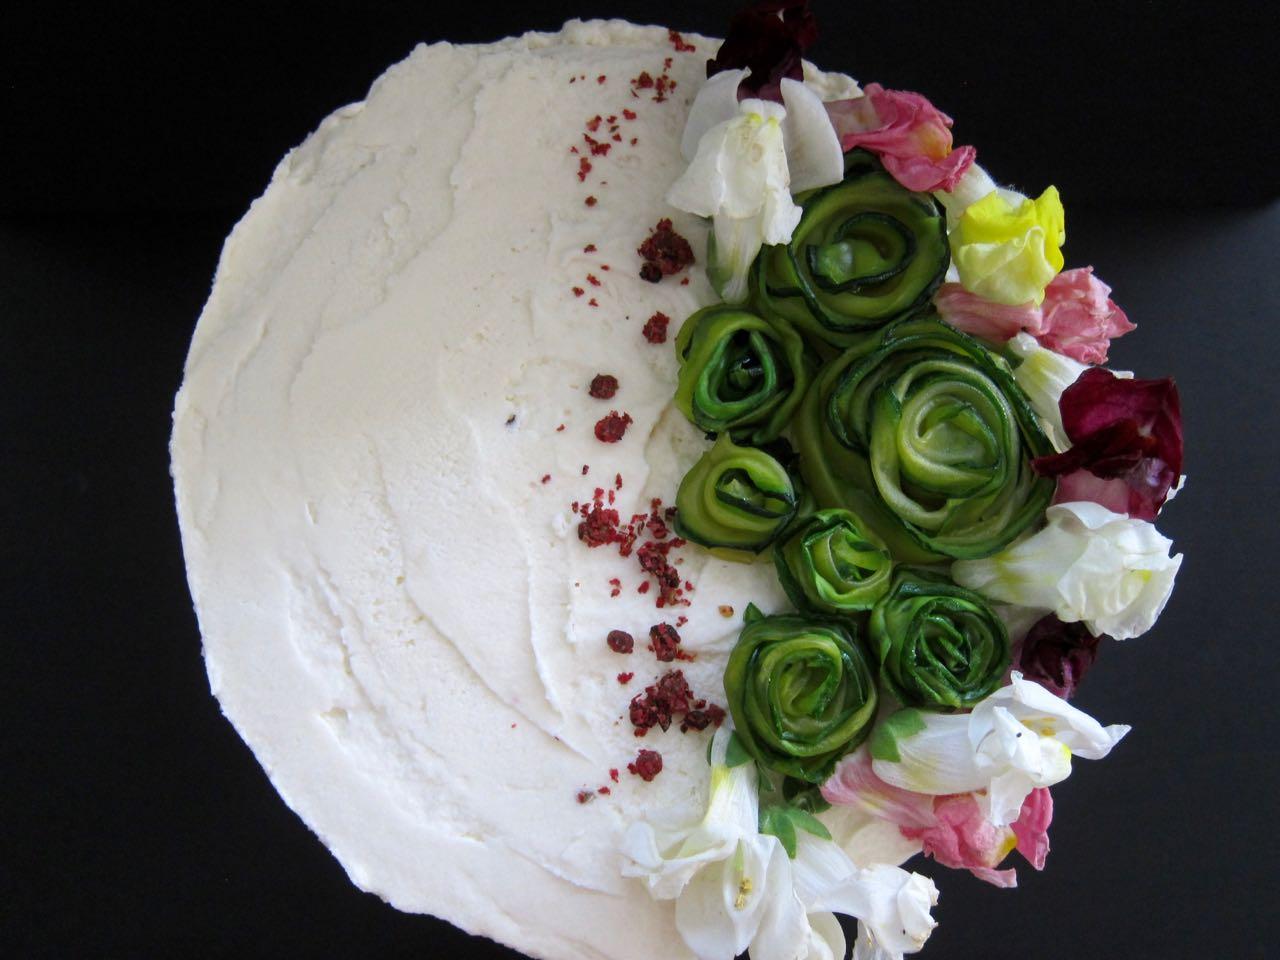 Chocolate Zucchini cake toppers